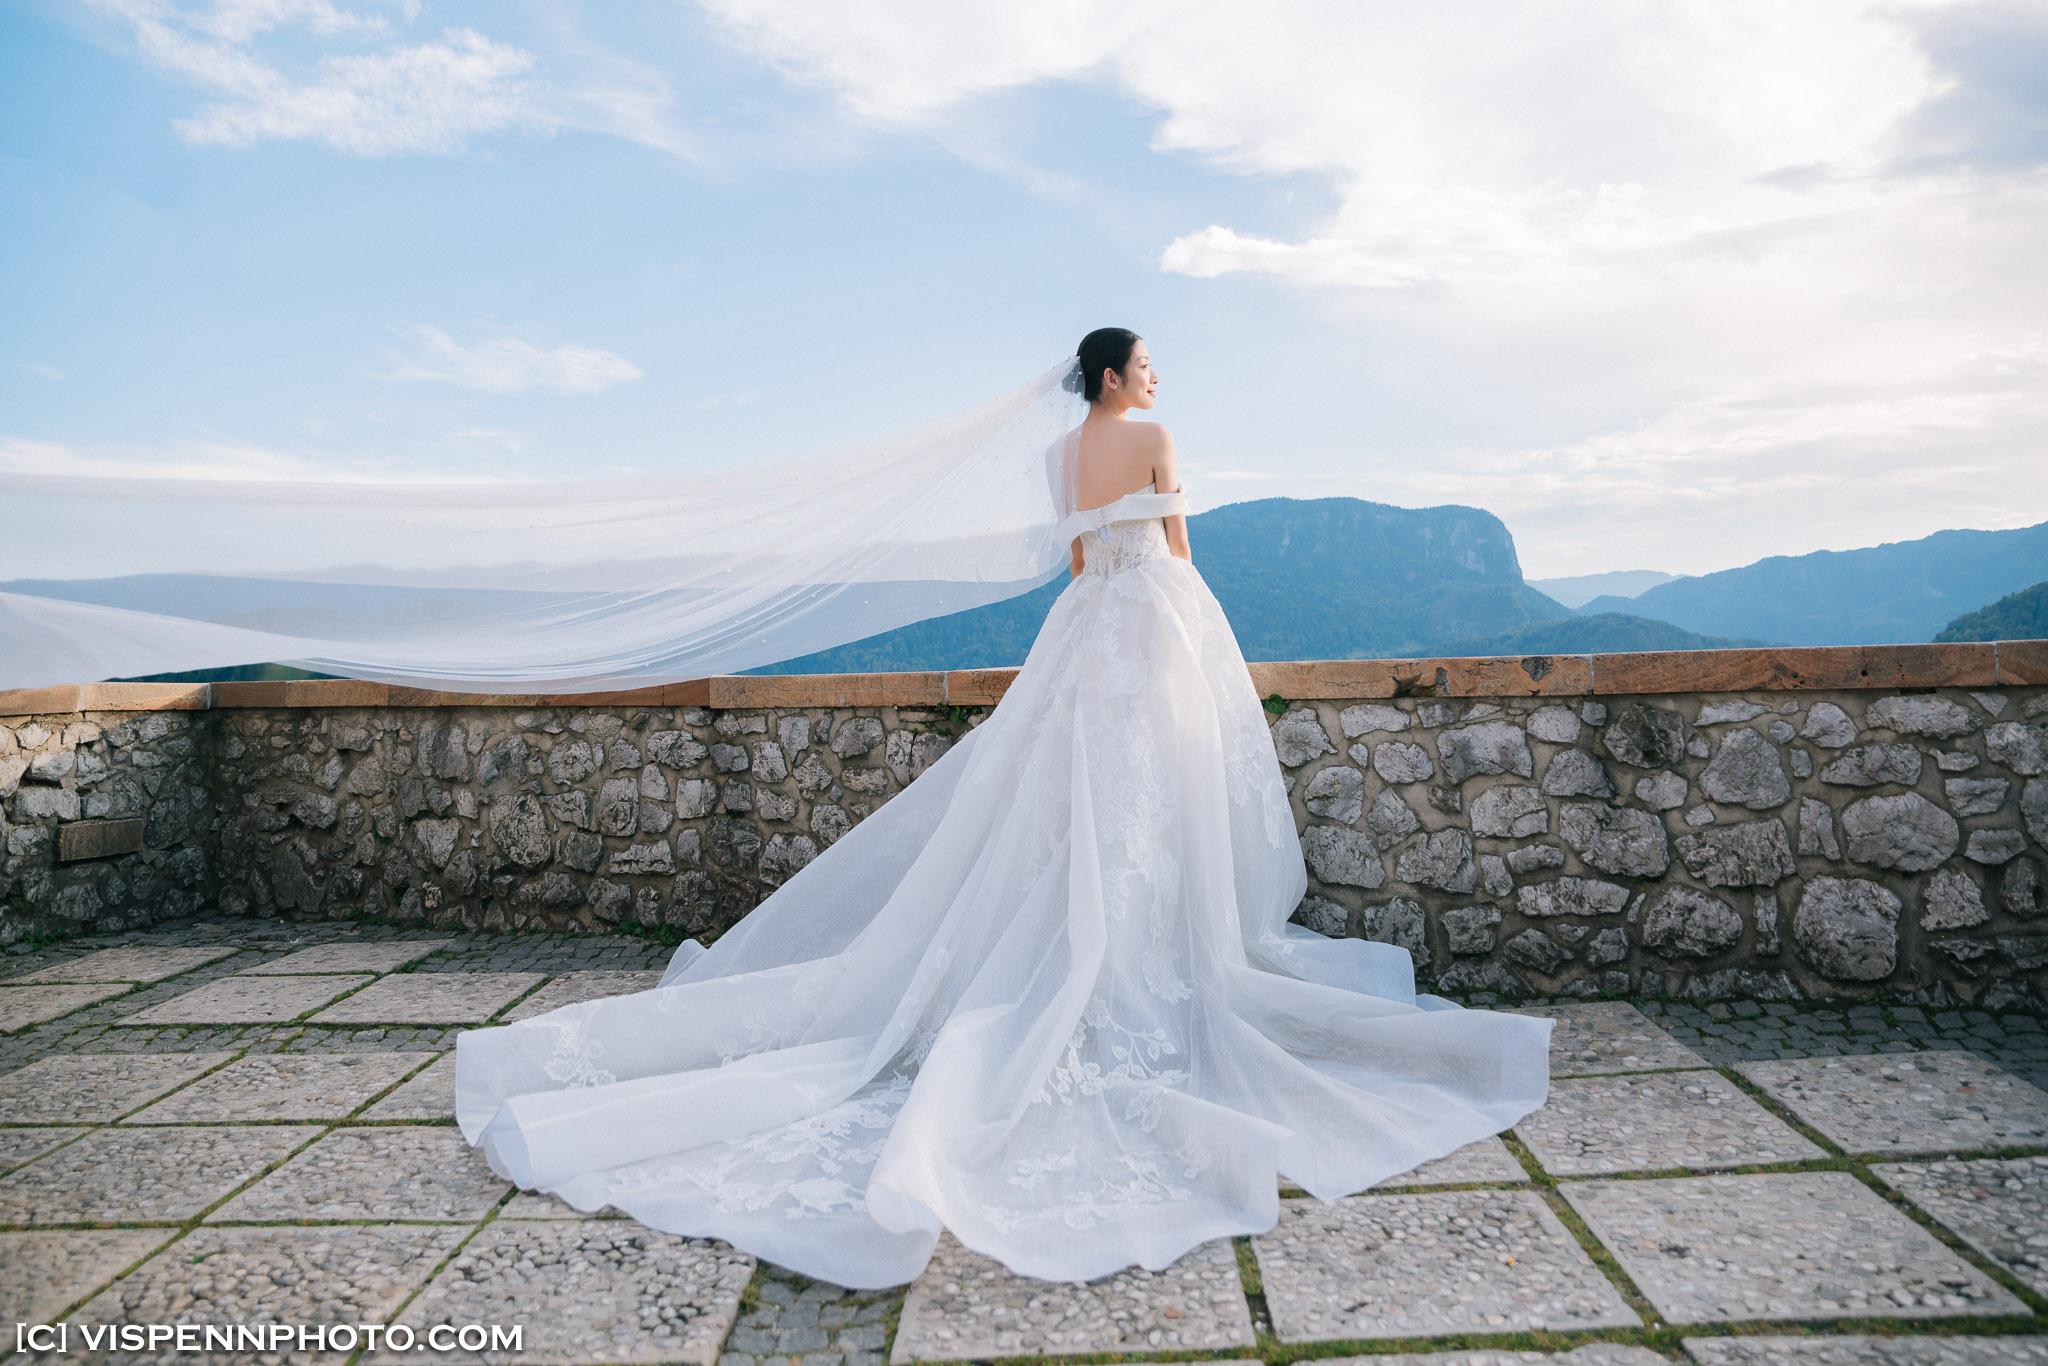 PRE WEDDING Photography Melbourne VISPENN 墨尔本 婚纱照 结婚照 婚纱摄影 DSC03969